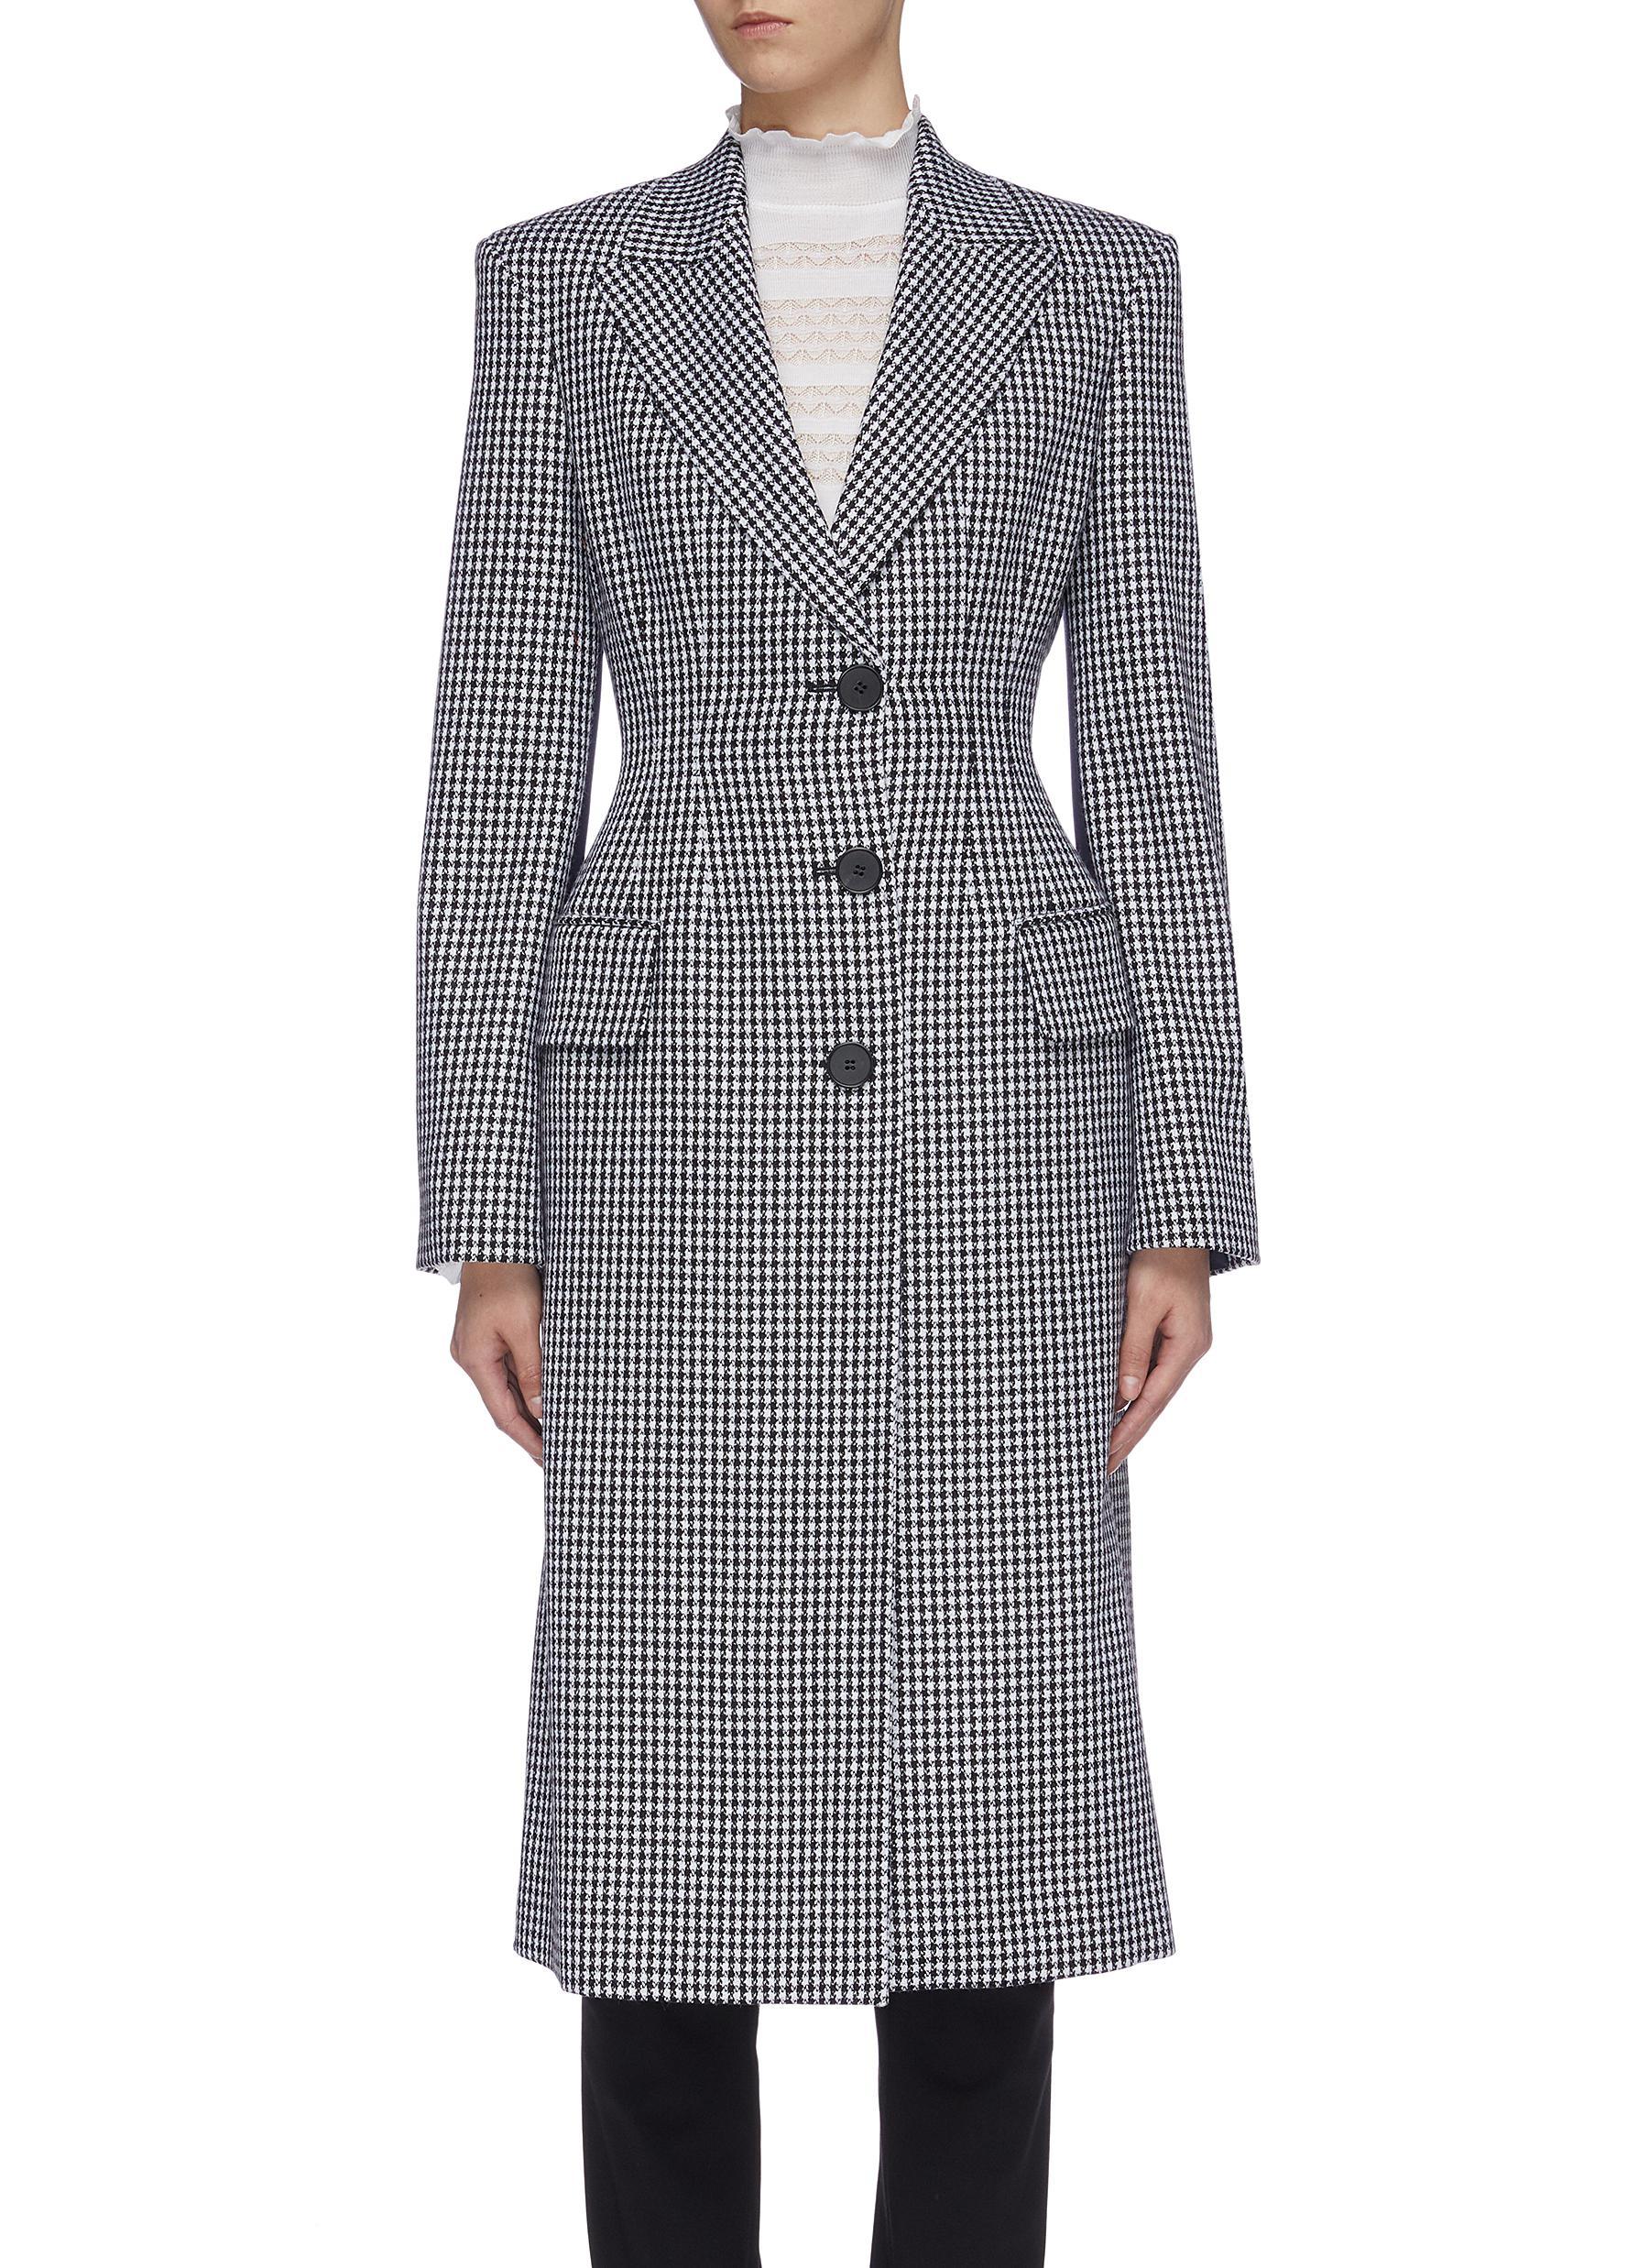 Darted silk back virgin wool houndstooth check coat by Alexander Mcqueen